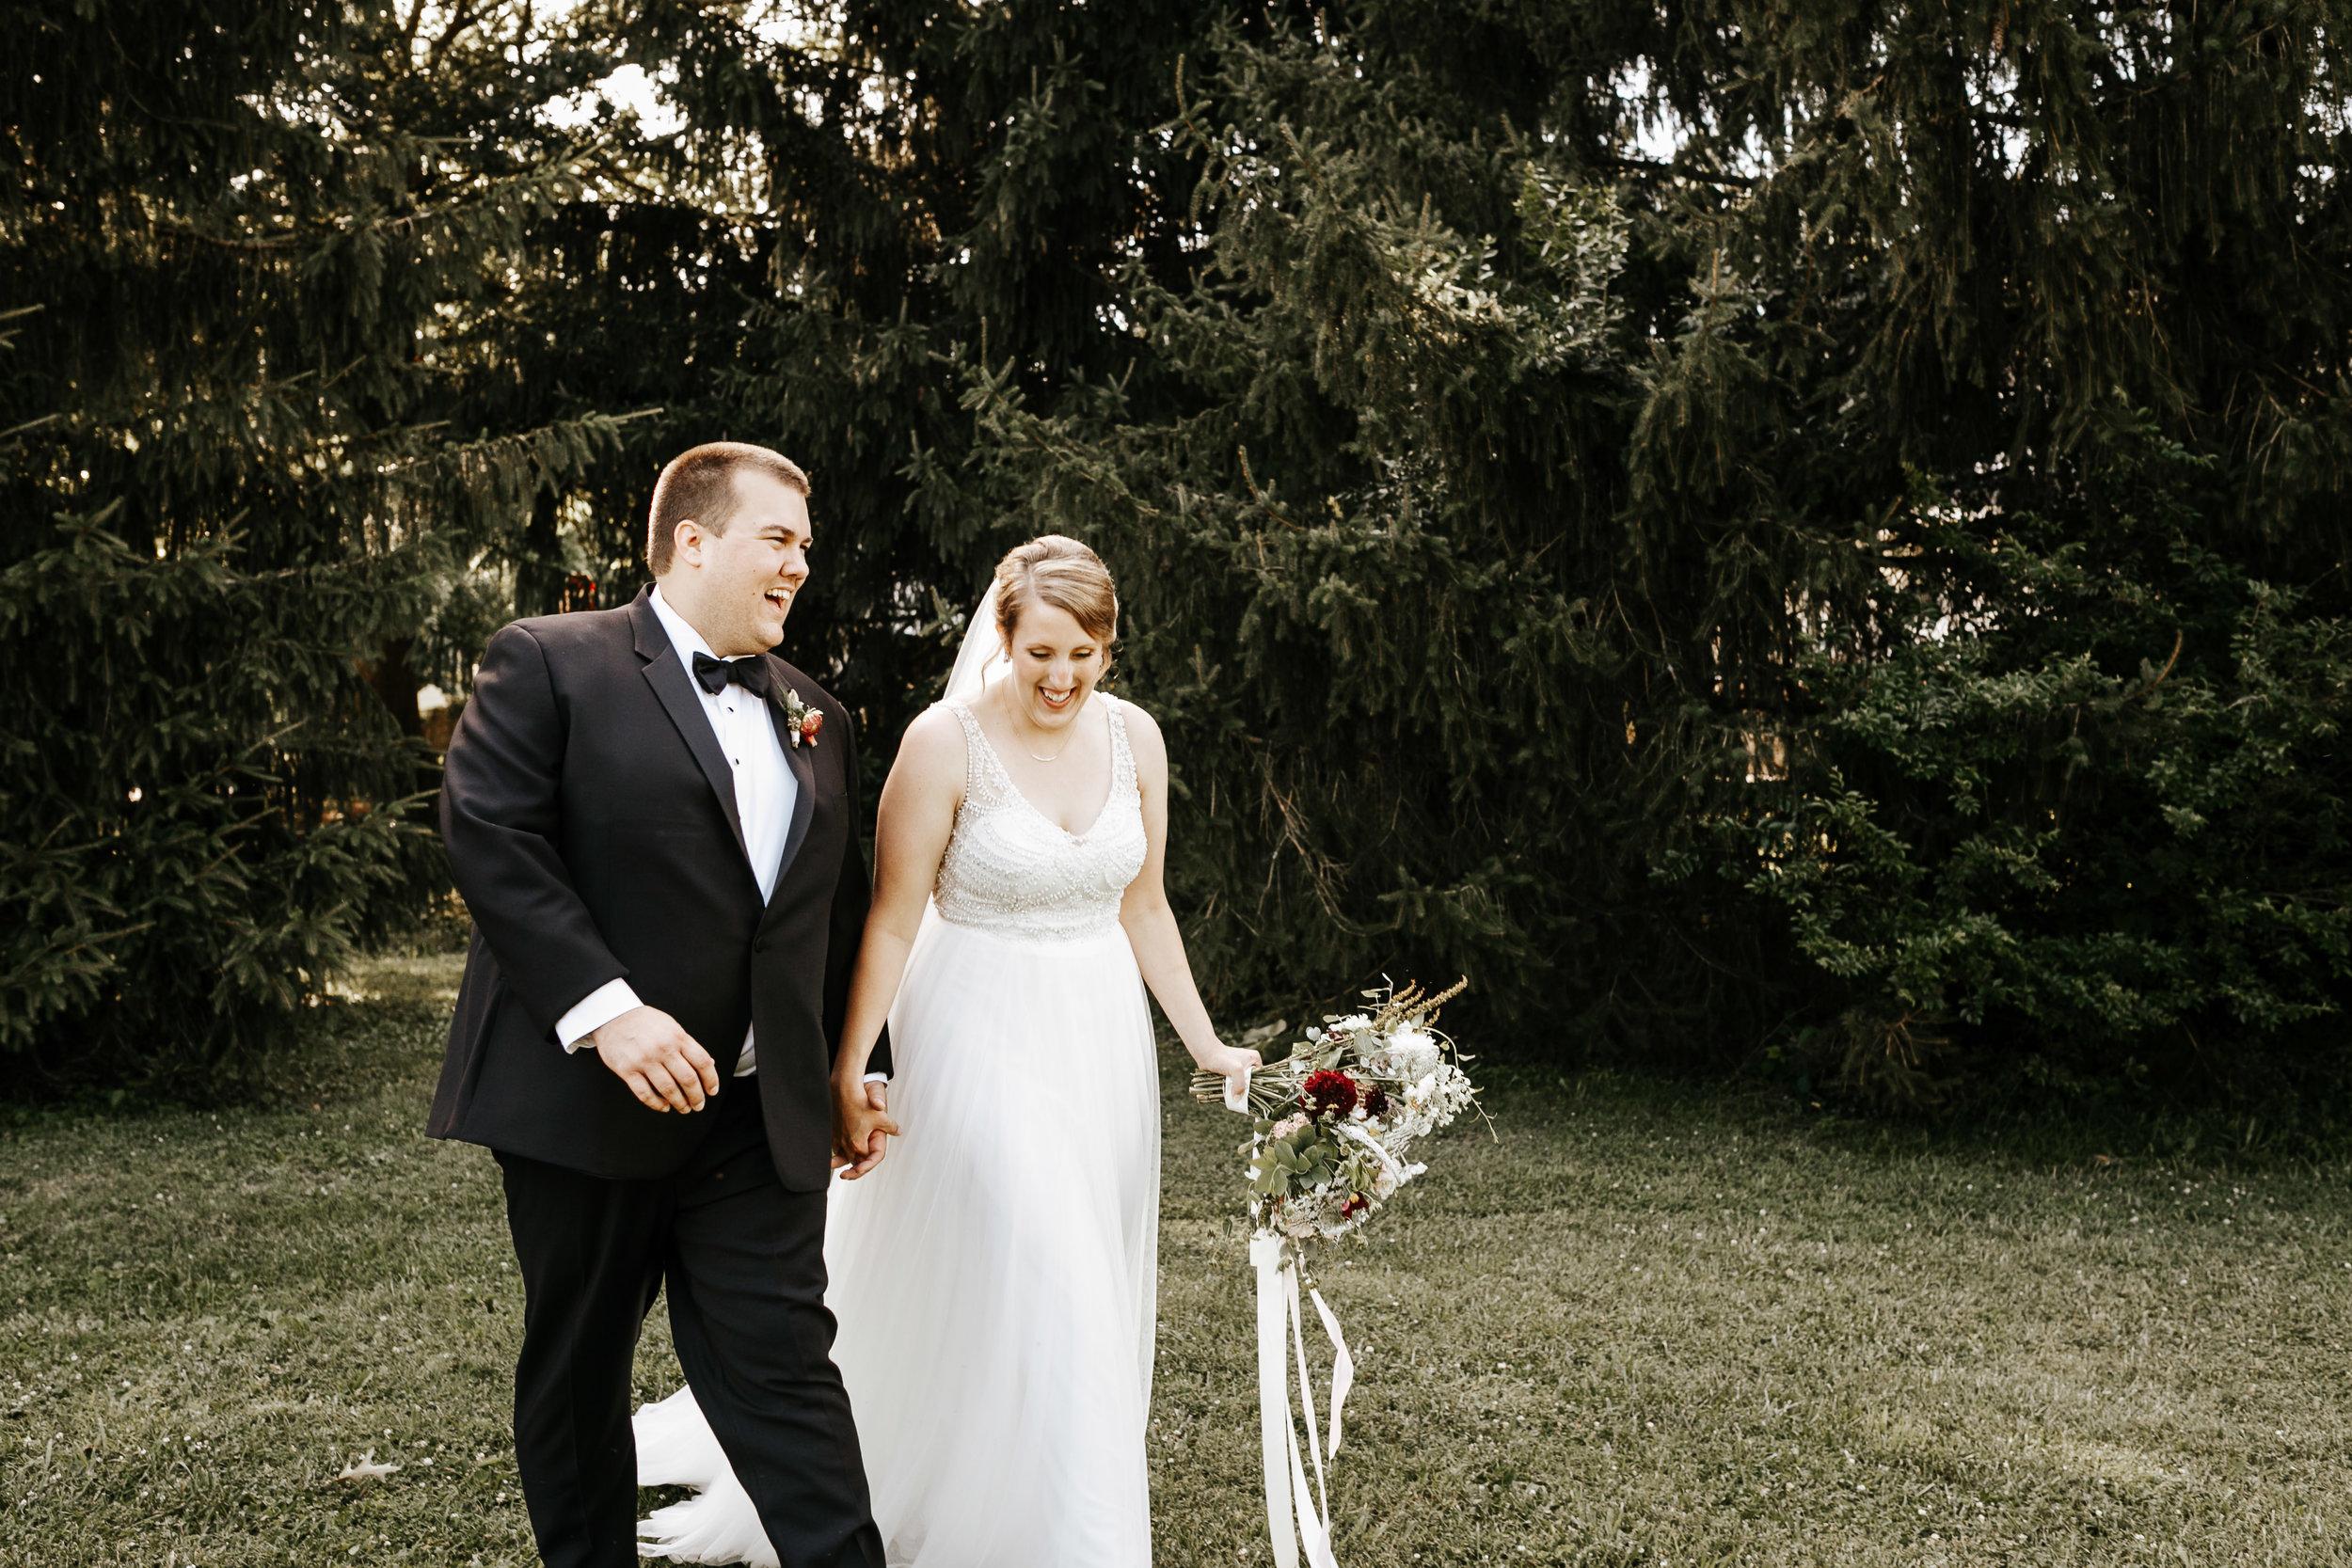 bohemian-photographer-wedding-tennessee-45.jpg